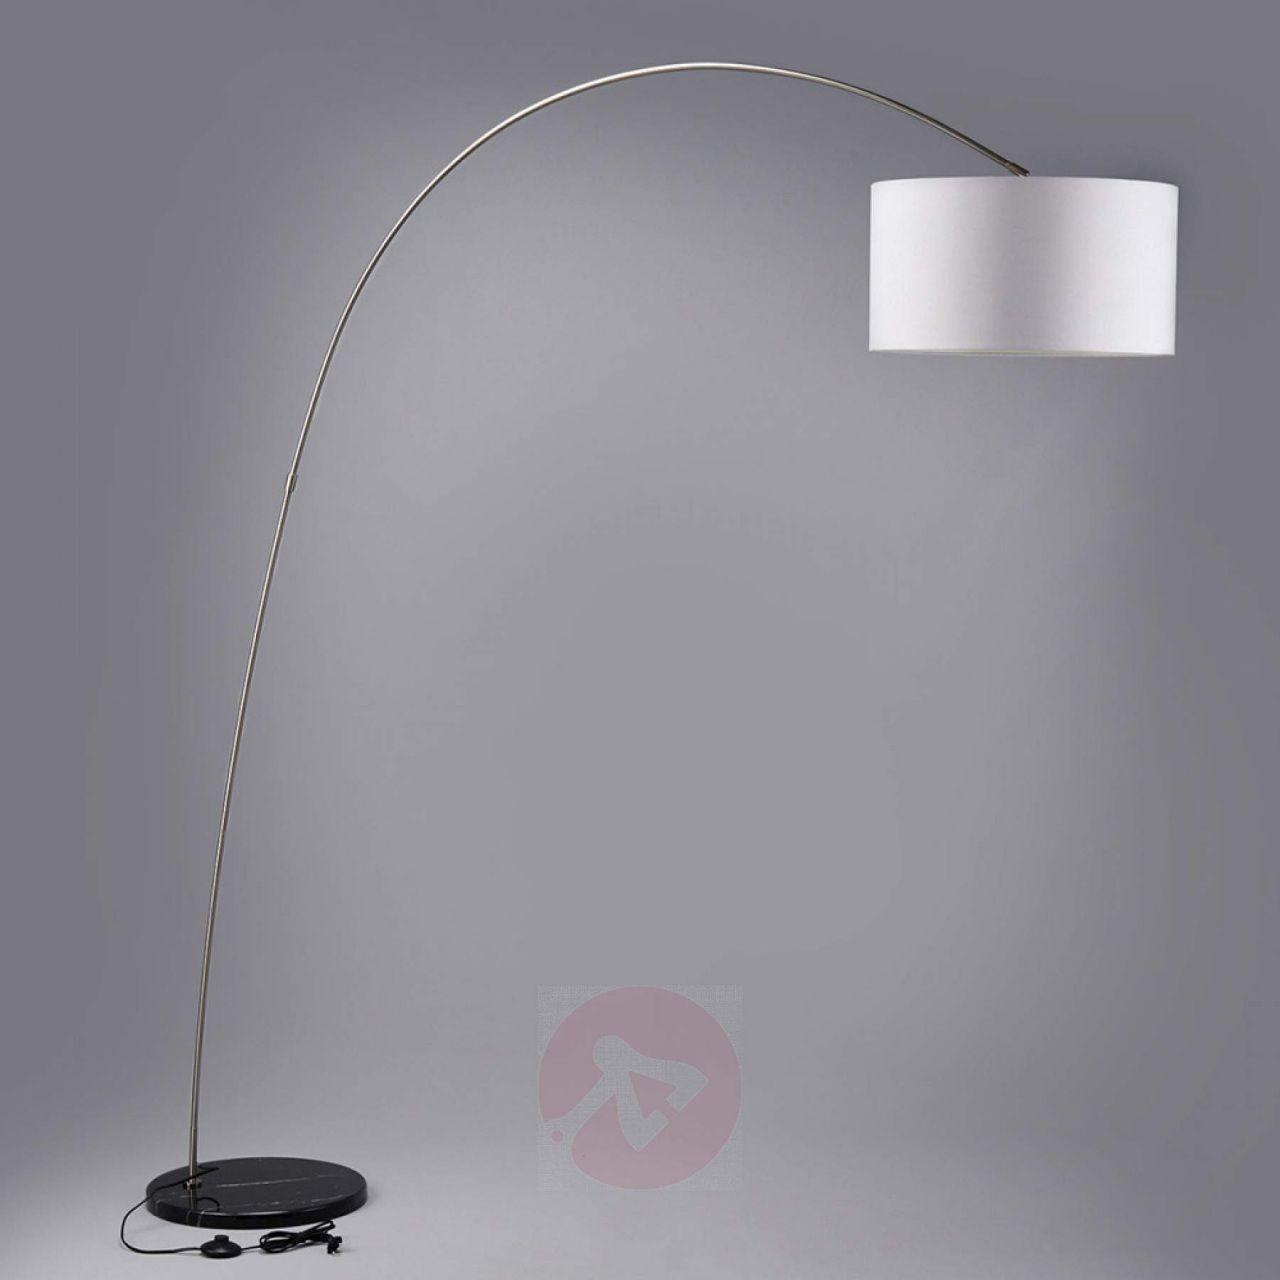 Badezimmer Lampe Diy Internetradio Fur Badezimmer Lampe Mit